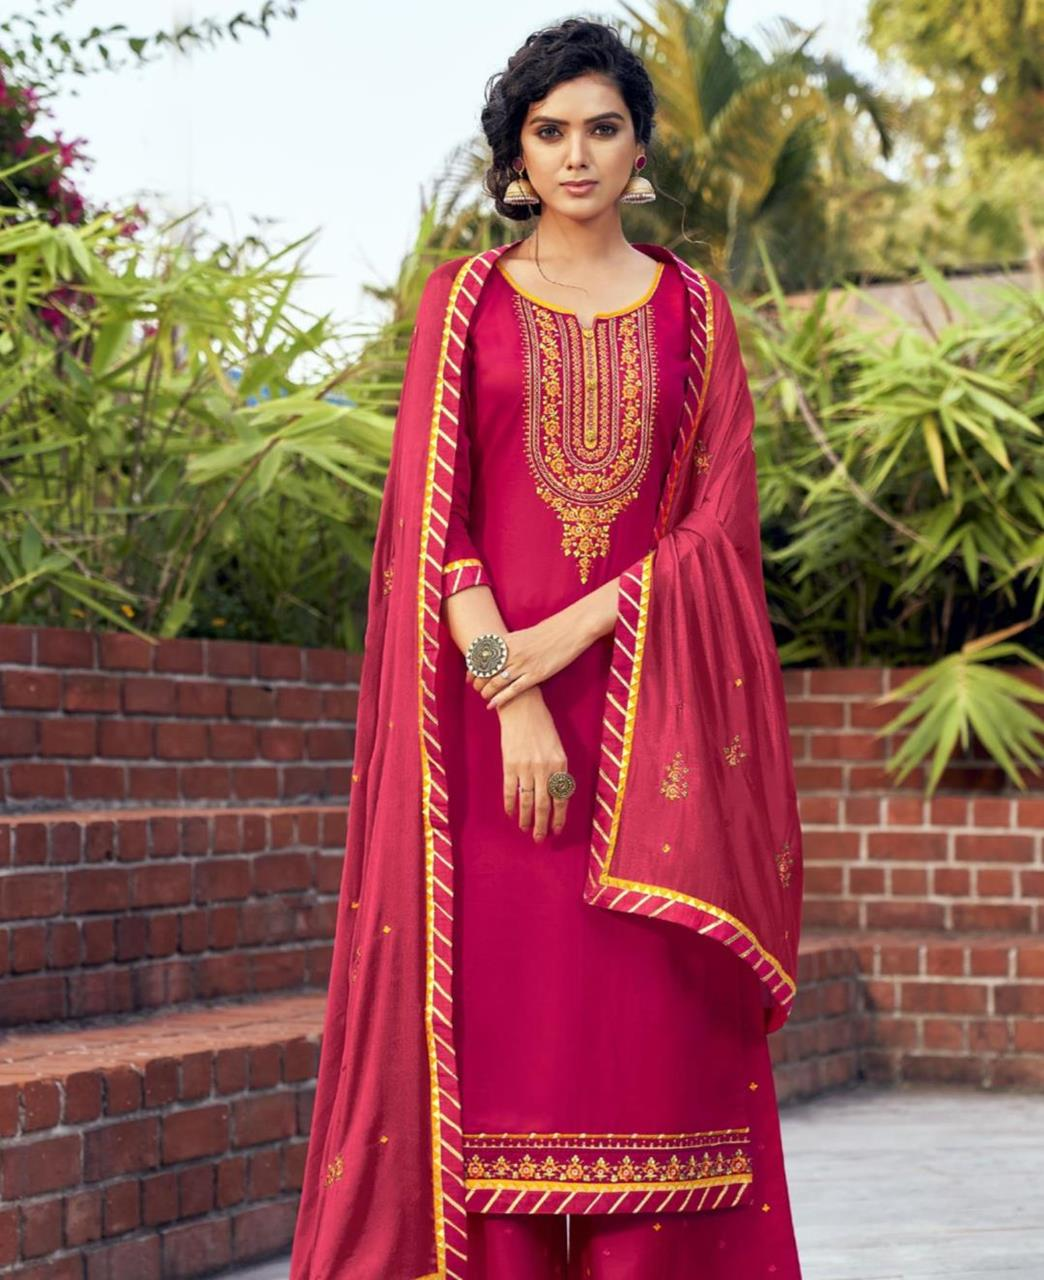 Embroidered Cotton Straight cut Salwar Kameez in Rani Pink